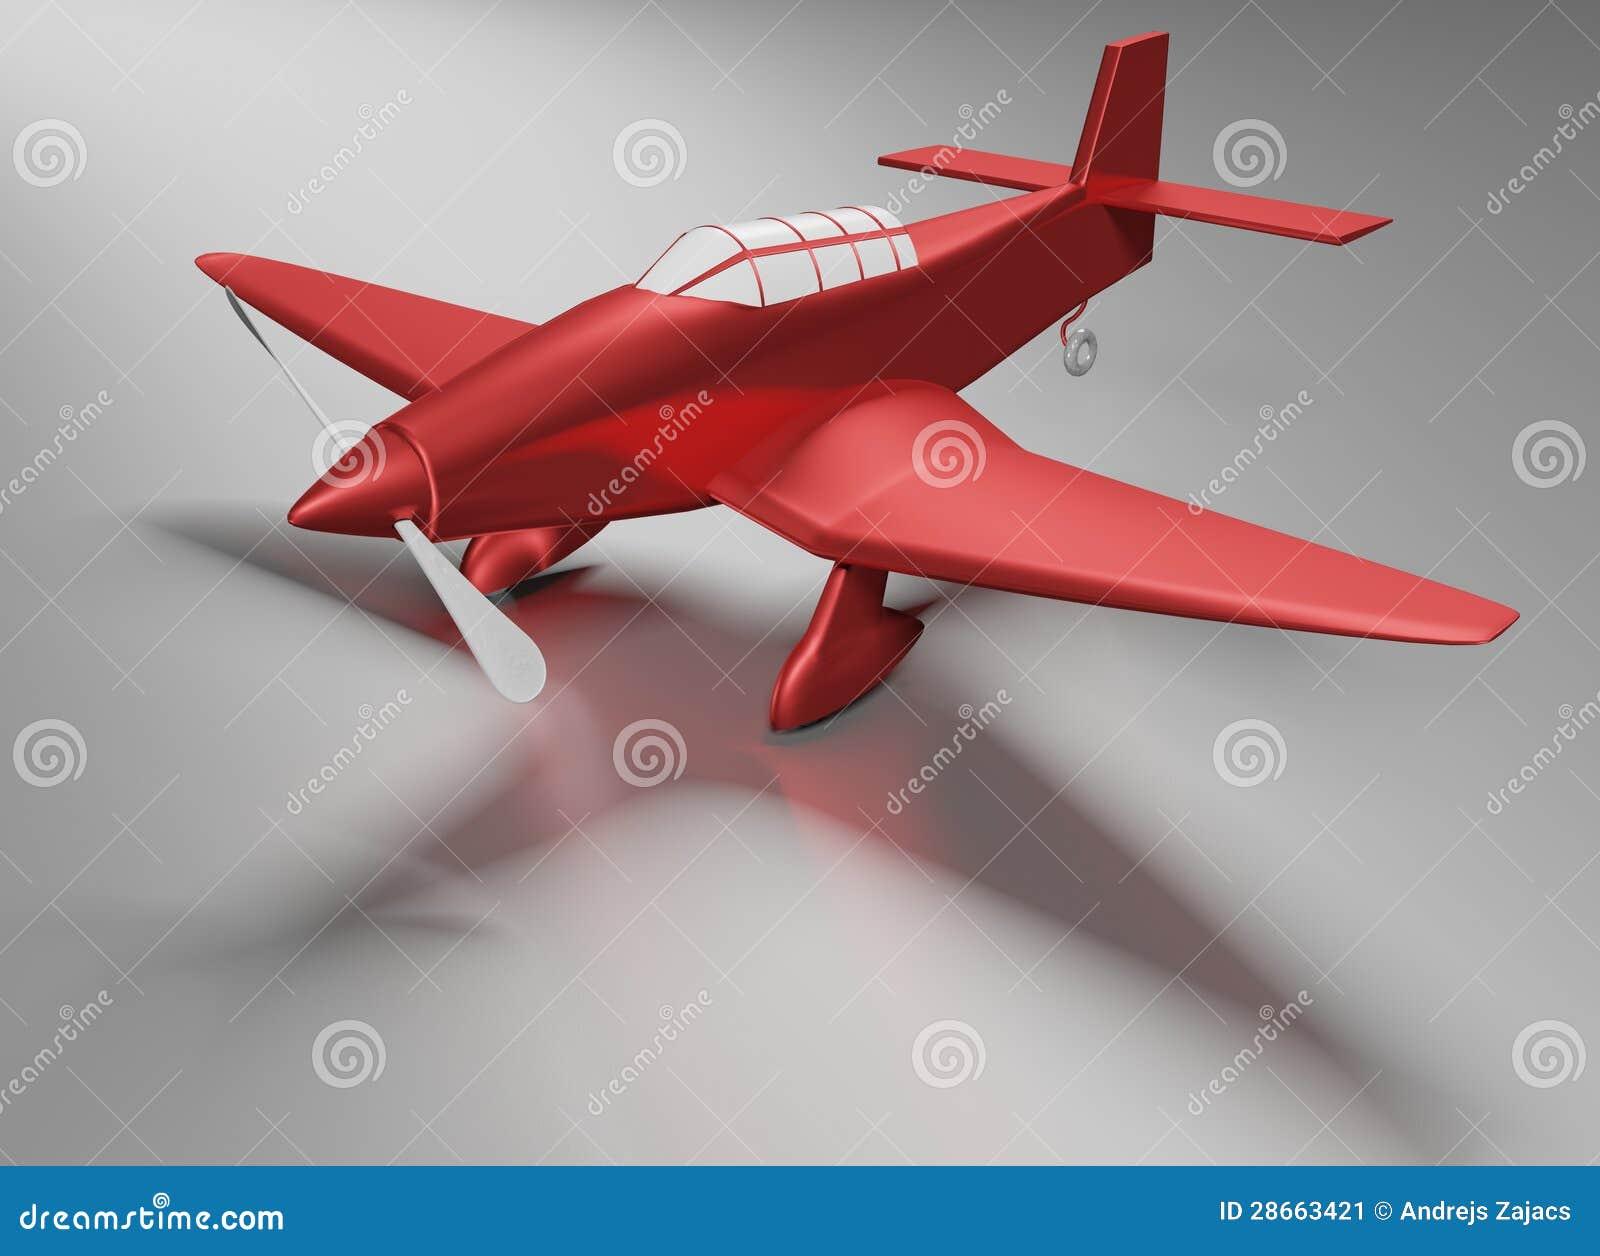 Wojenny samolot, junkiery